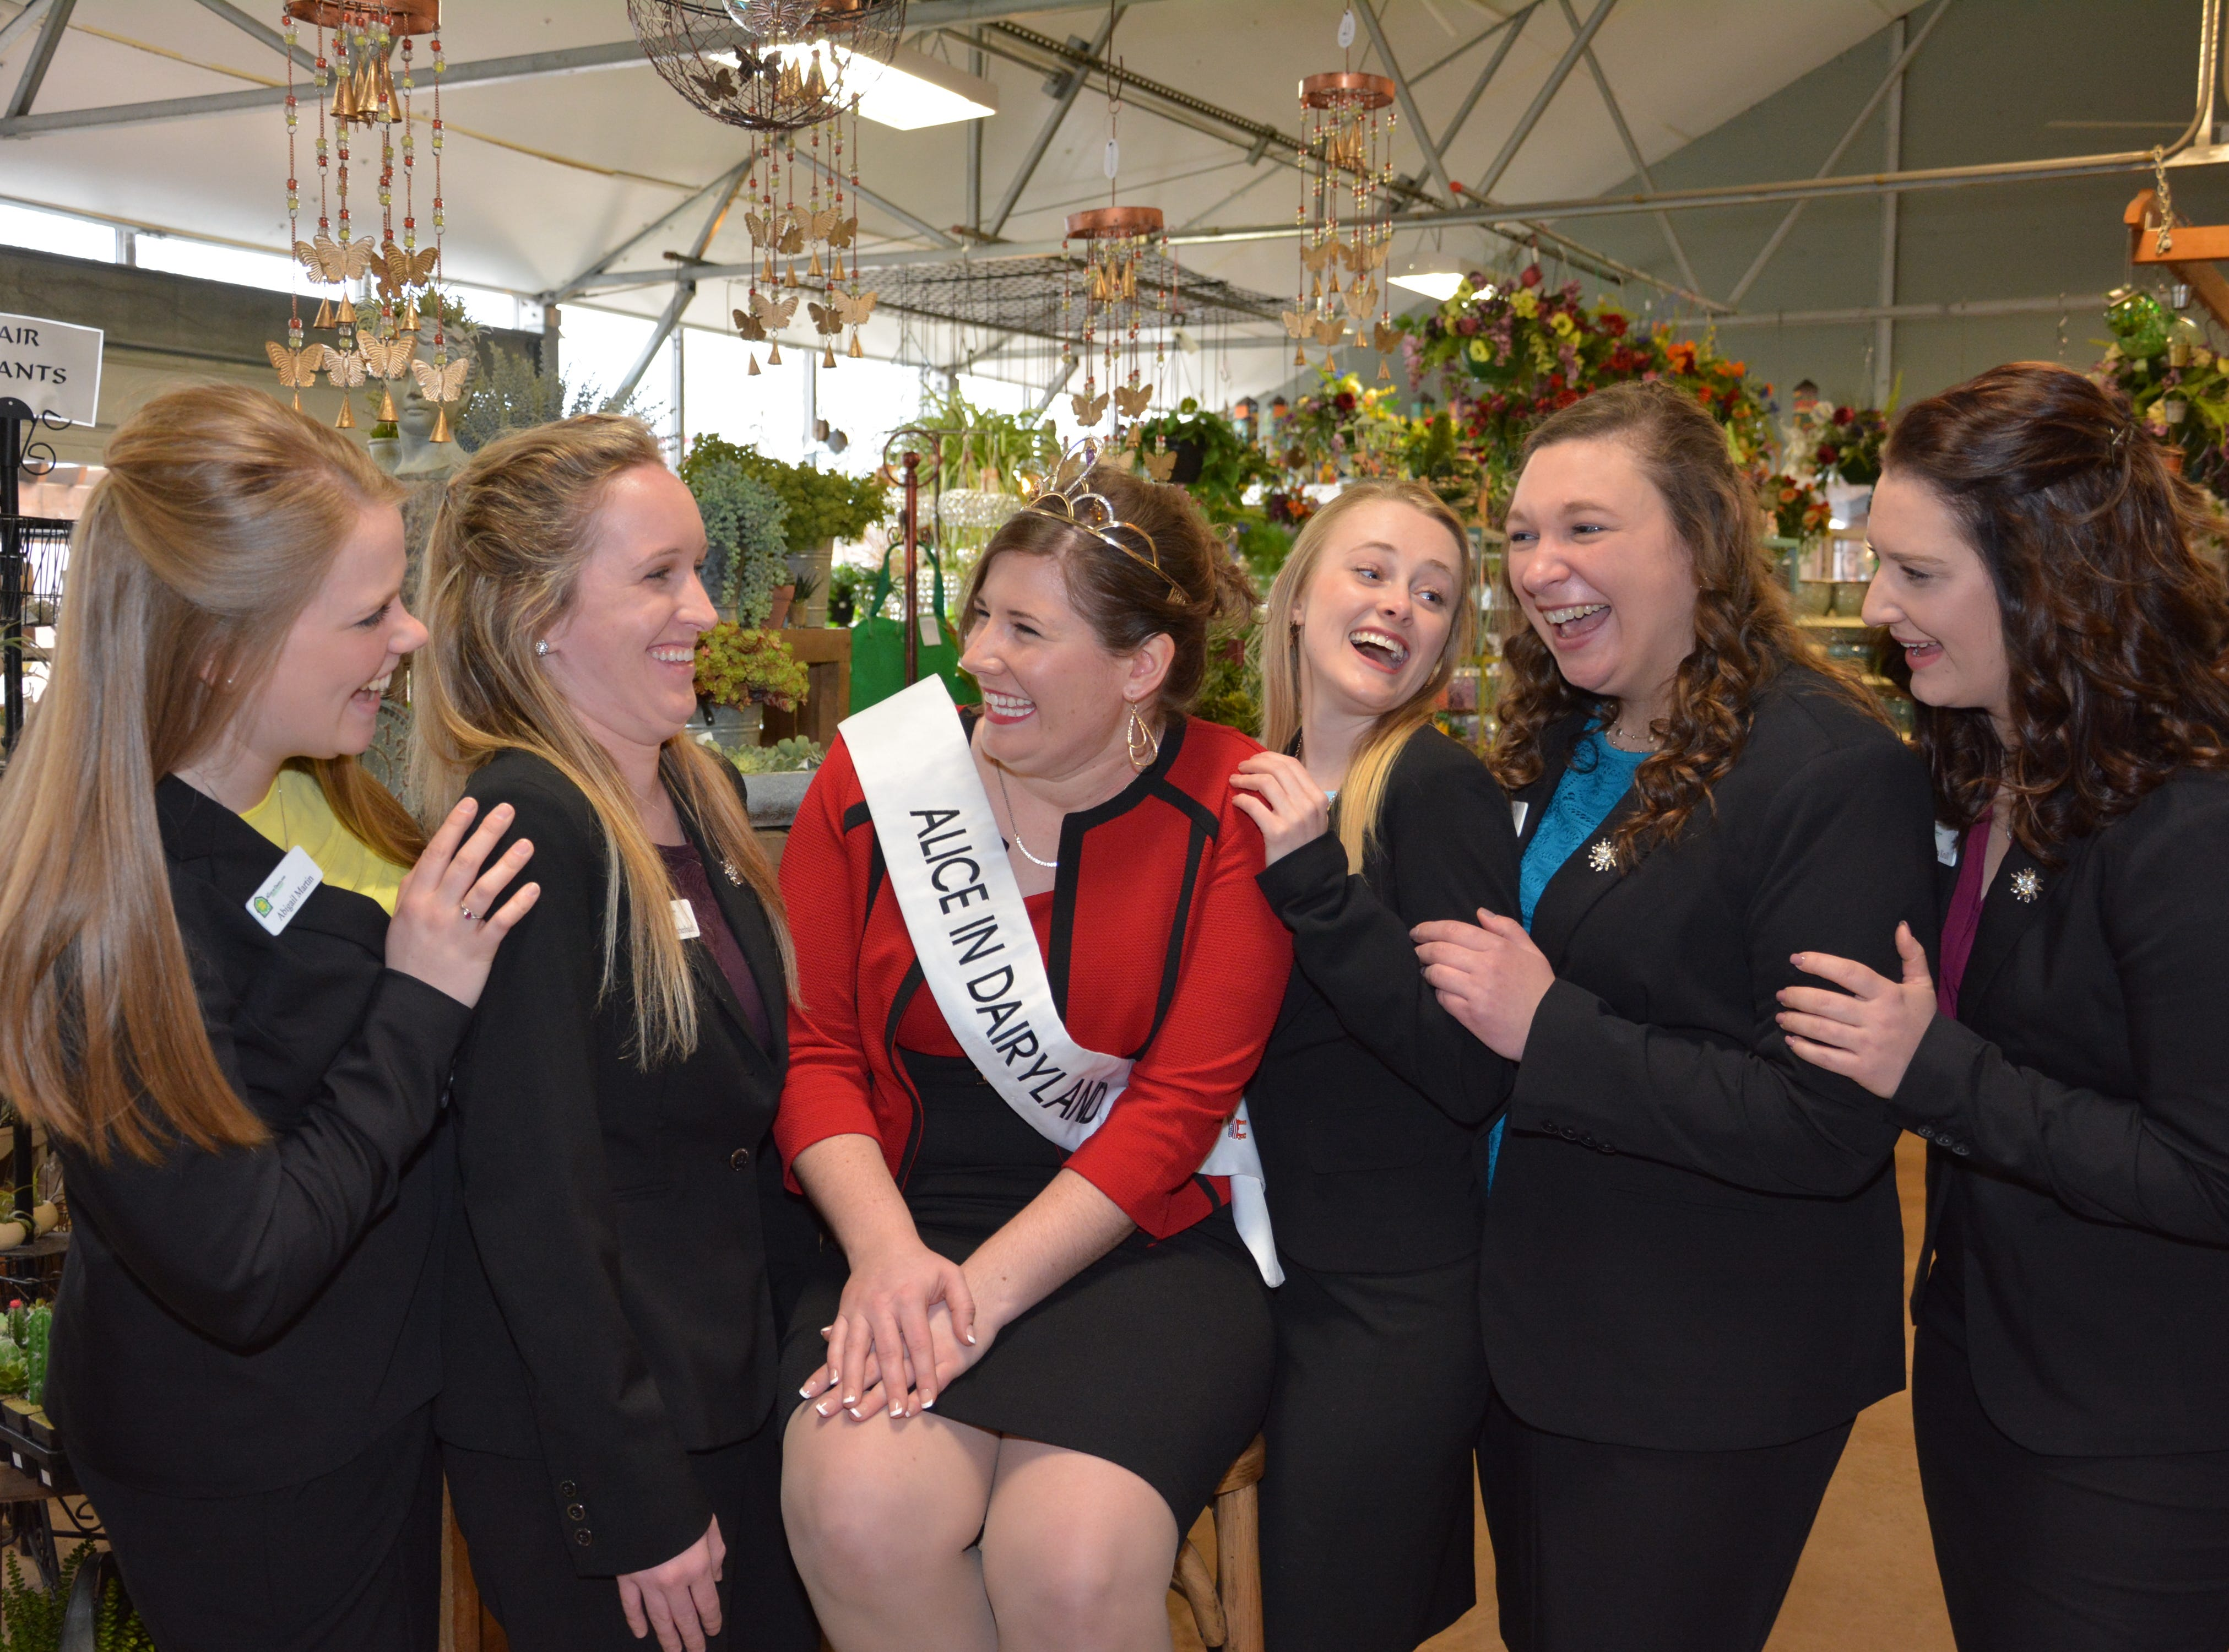 Sharing a laugh inside of Brenda's Blumenladen in downtown New Glarus